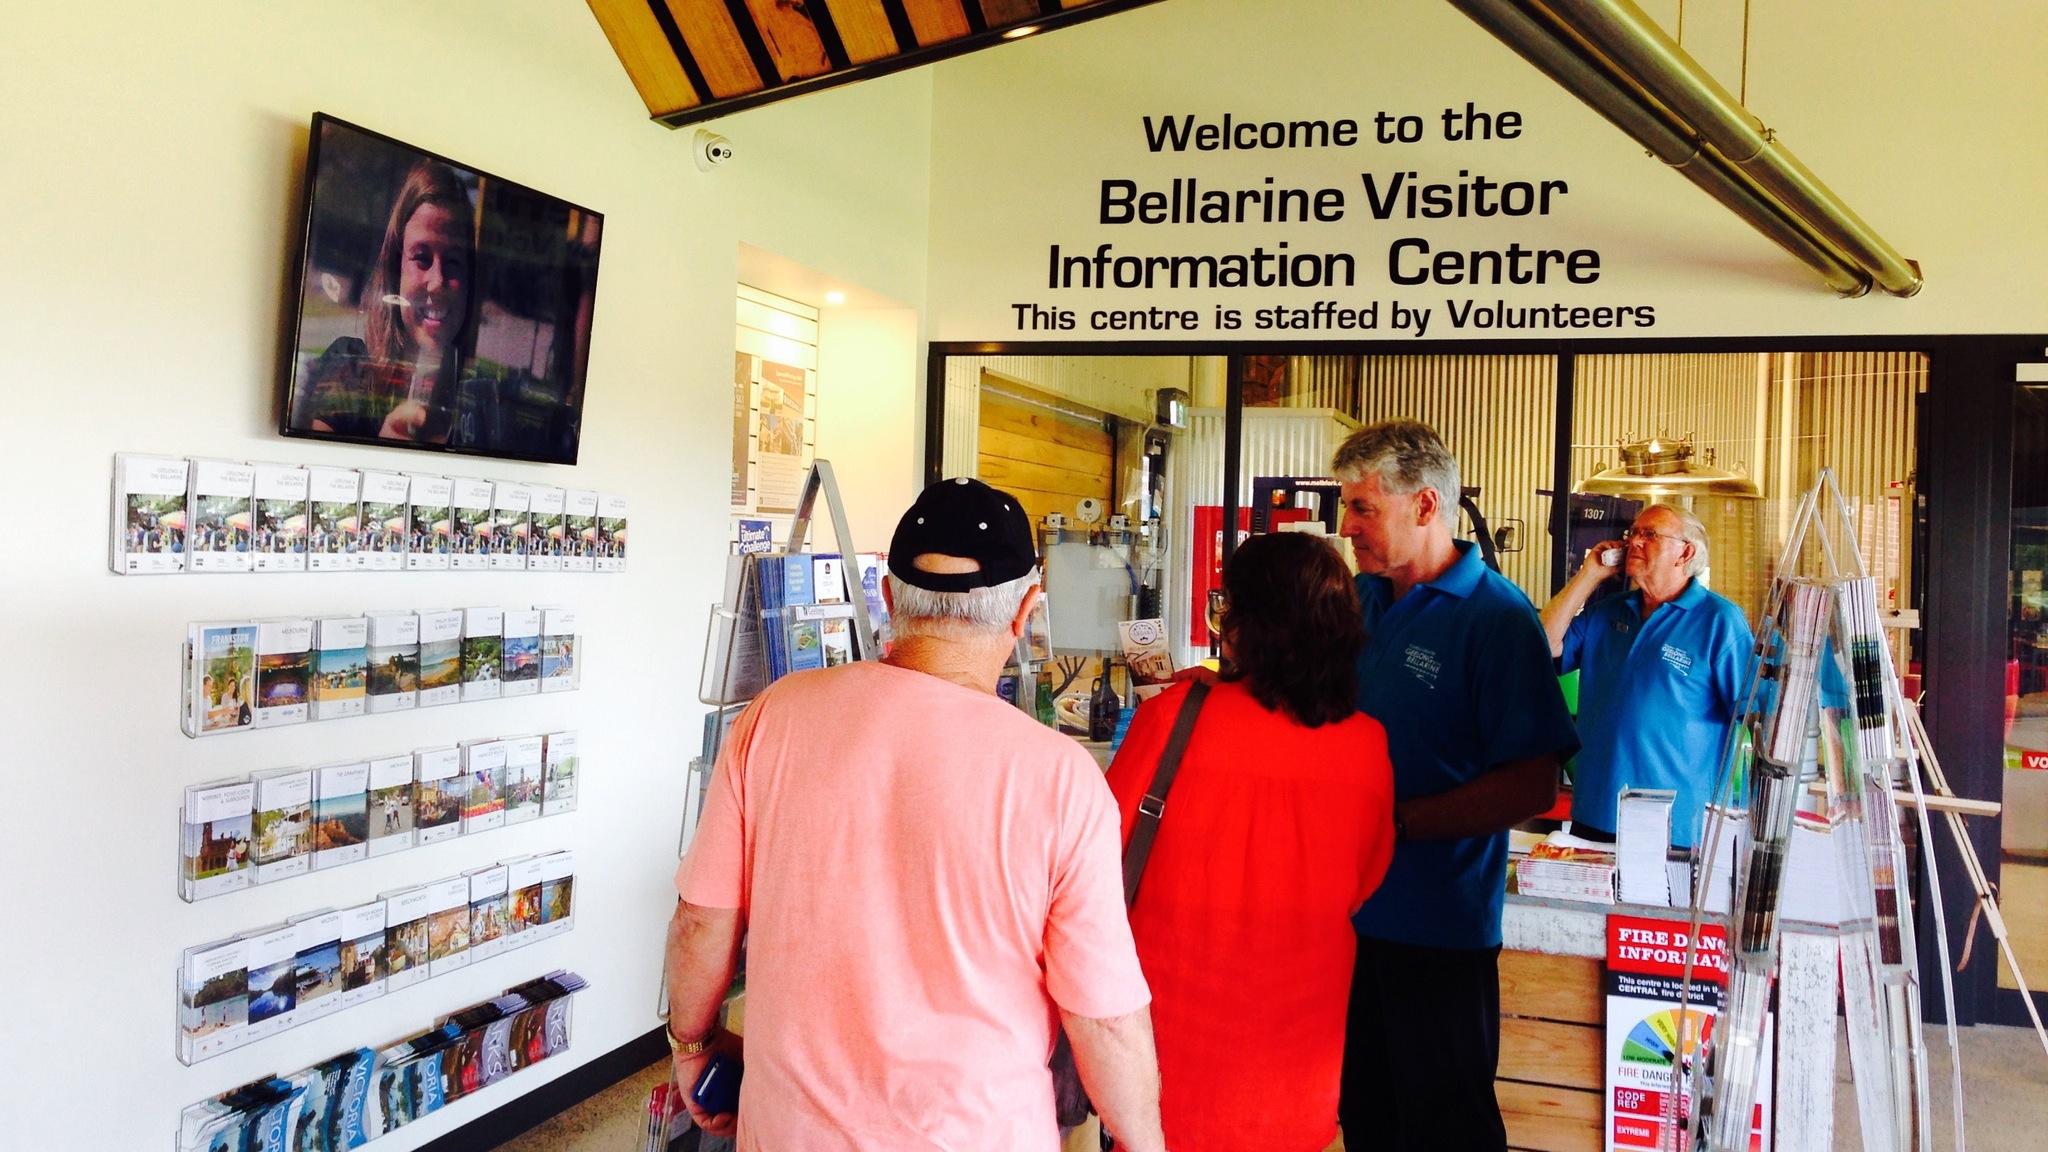 Bellarine Visitor Information Centre